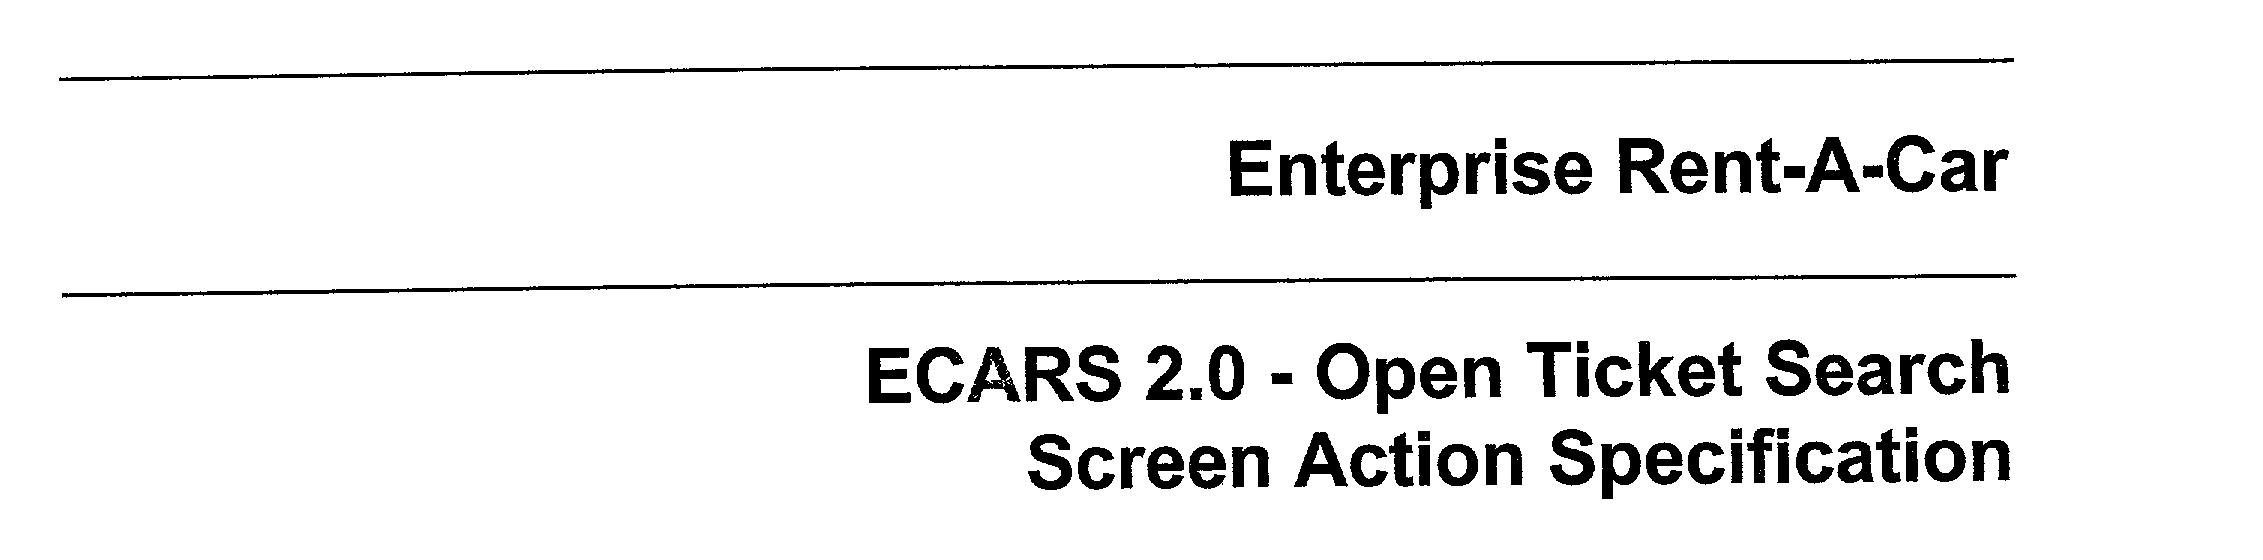 Figure US20030125992A1-20030703-P01941